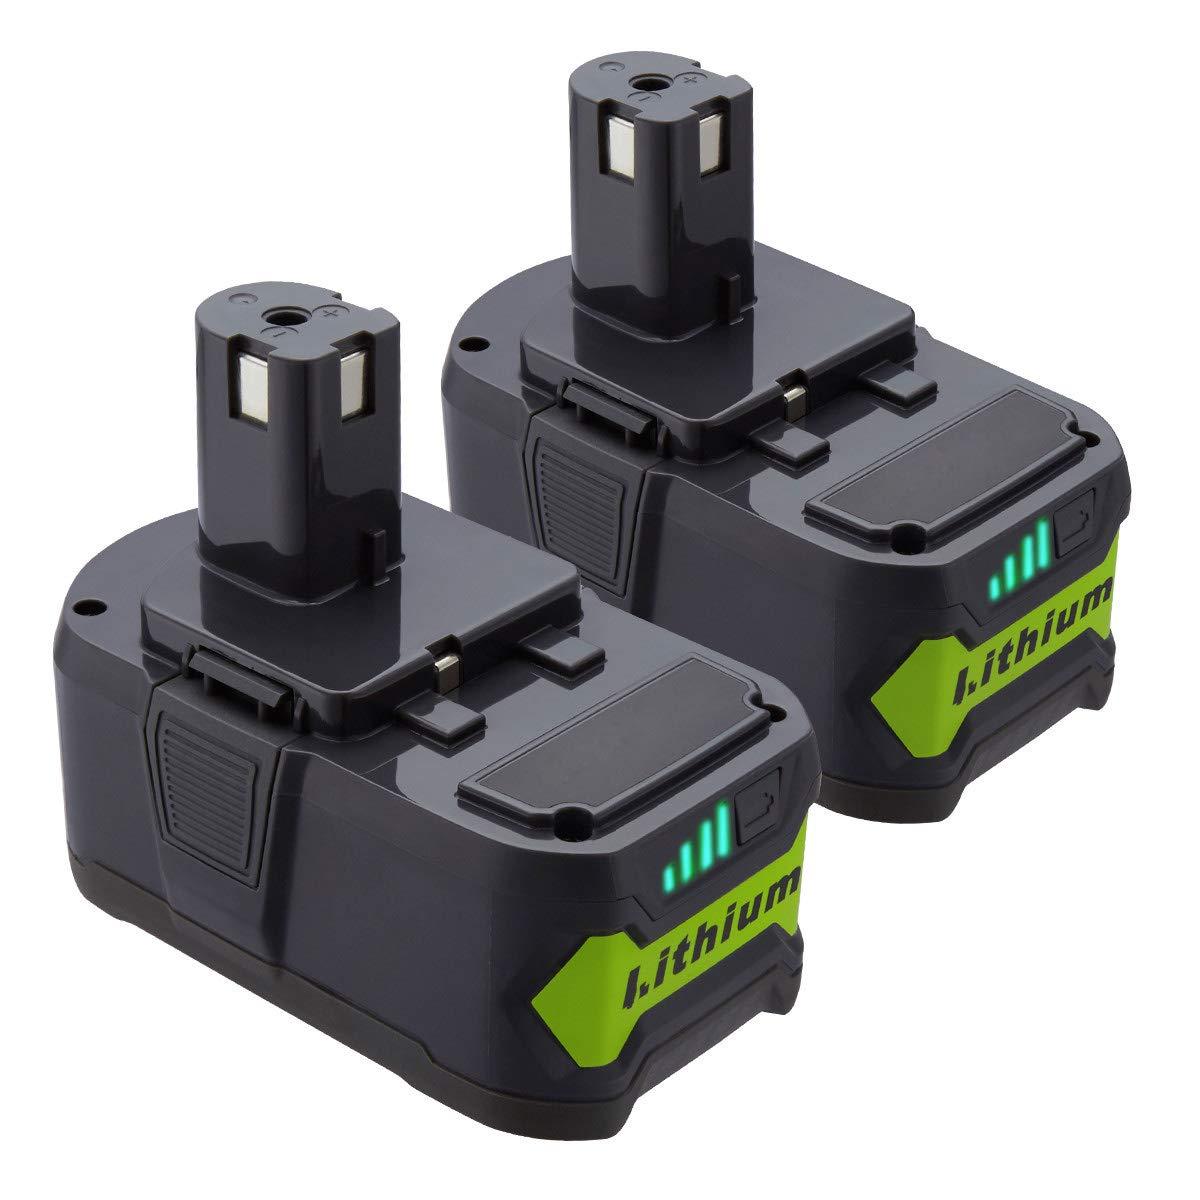 Powerextra 2 Pack 5000mAh Ryobi 18V Lithium Replacement Battery for Ryobi 18 Volt ONE+ P102 P103 P104 P105 P107 P109 P122 Cordless Power Tools (2 Pack)